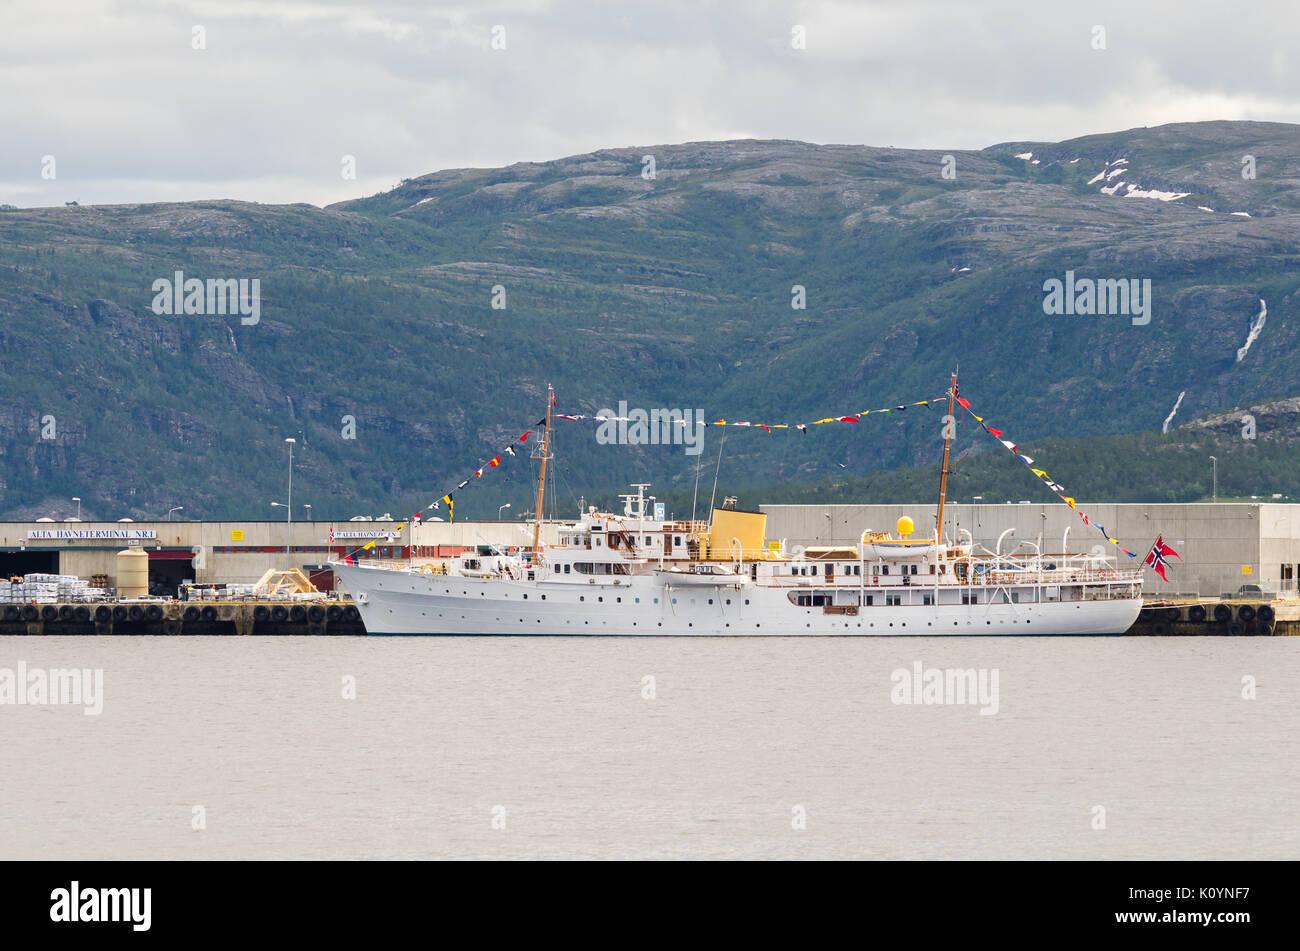 Kongeskipet, Norge, kingship, Norway, - Stock Image